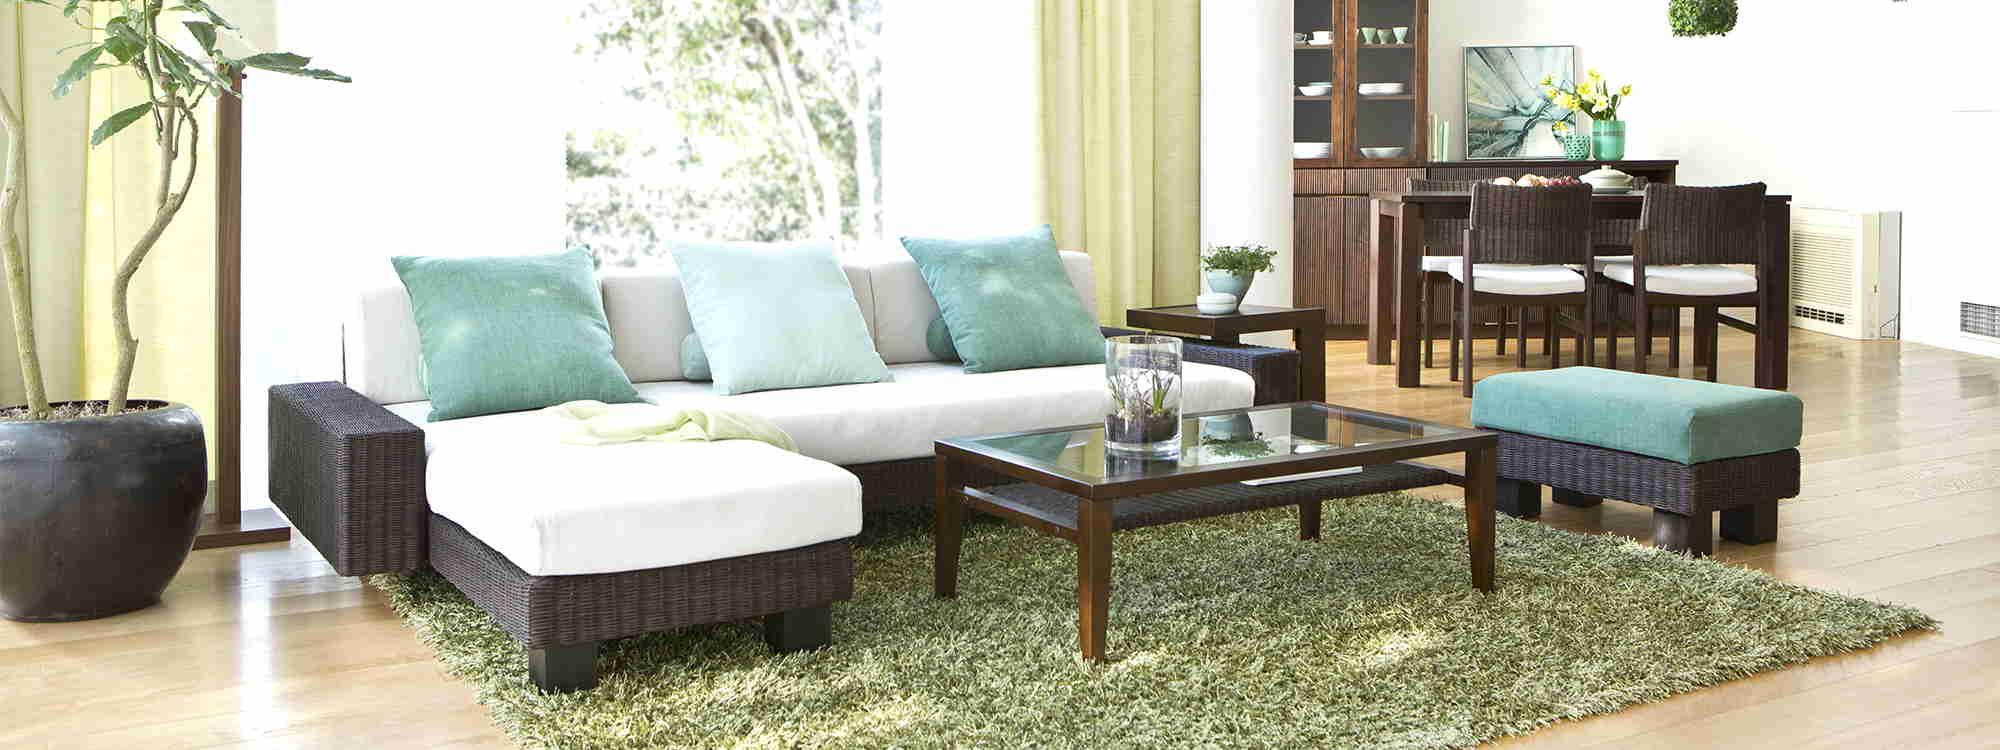 a.flat その暮らしに、アジアの風を|ガーデングリーン